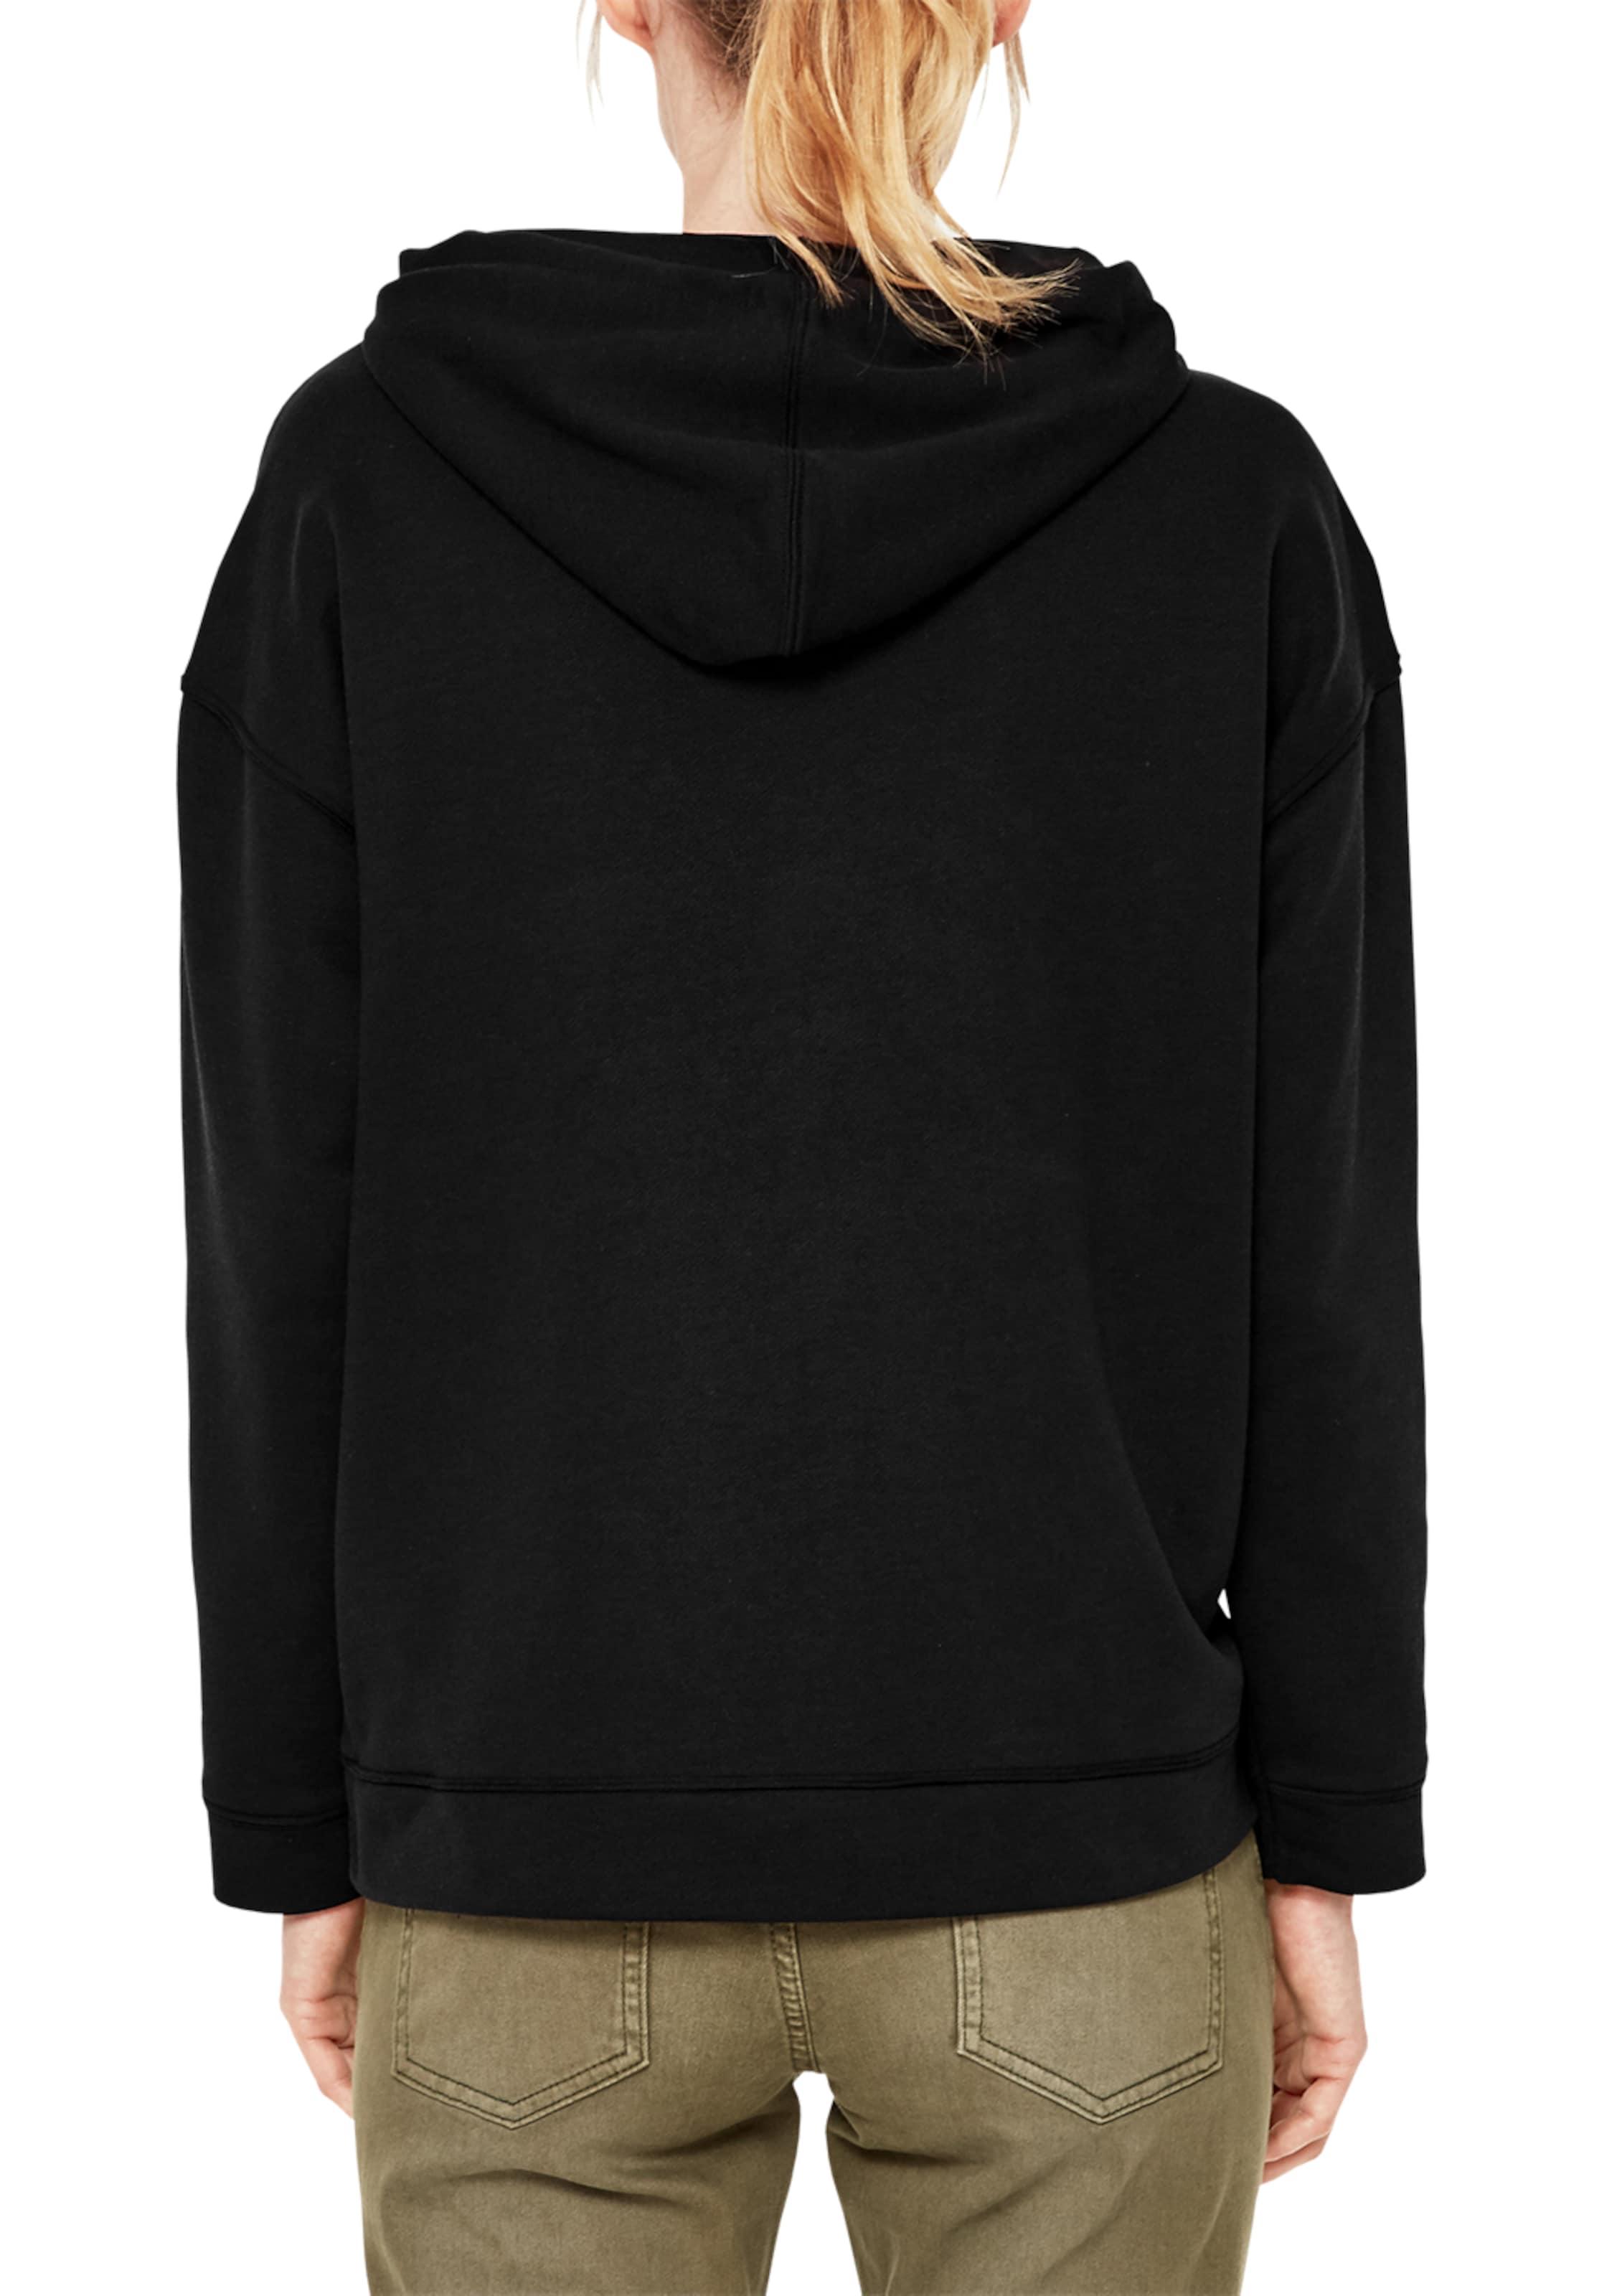 oliver Sweatshirt Schwarz S Schwarz S In oliver Sweatshirt In rBoedCx